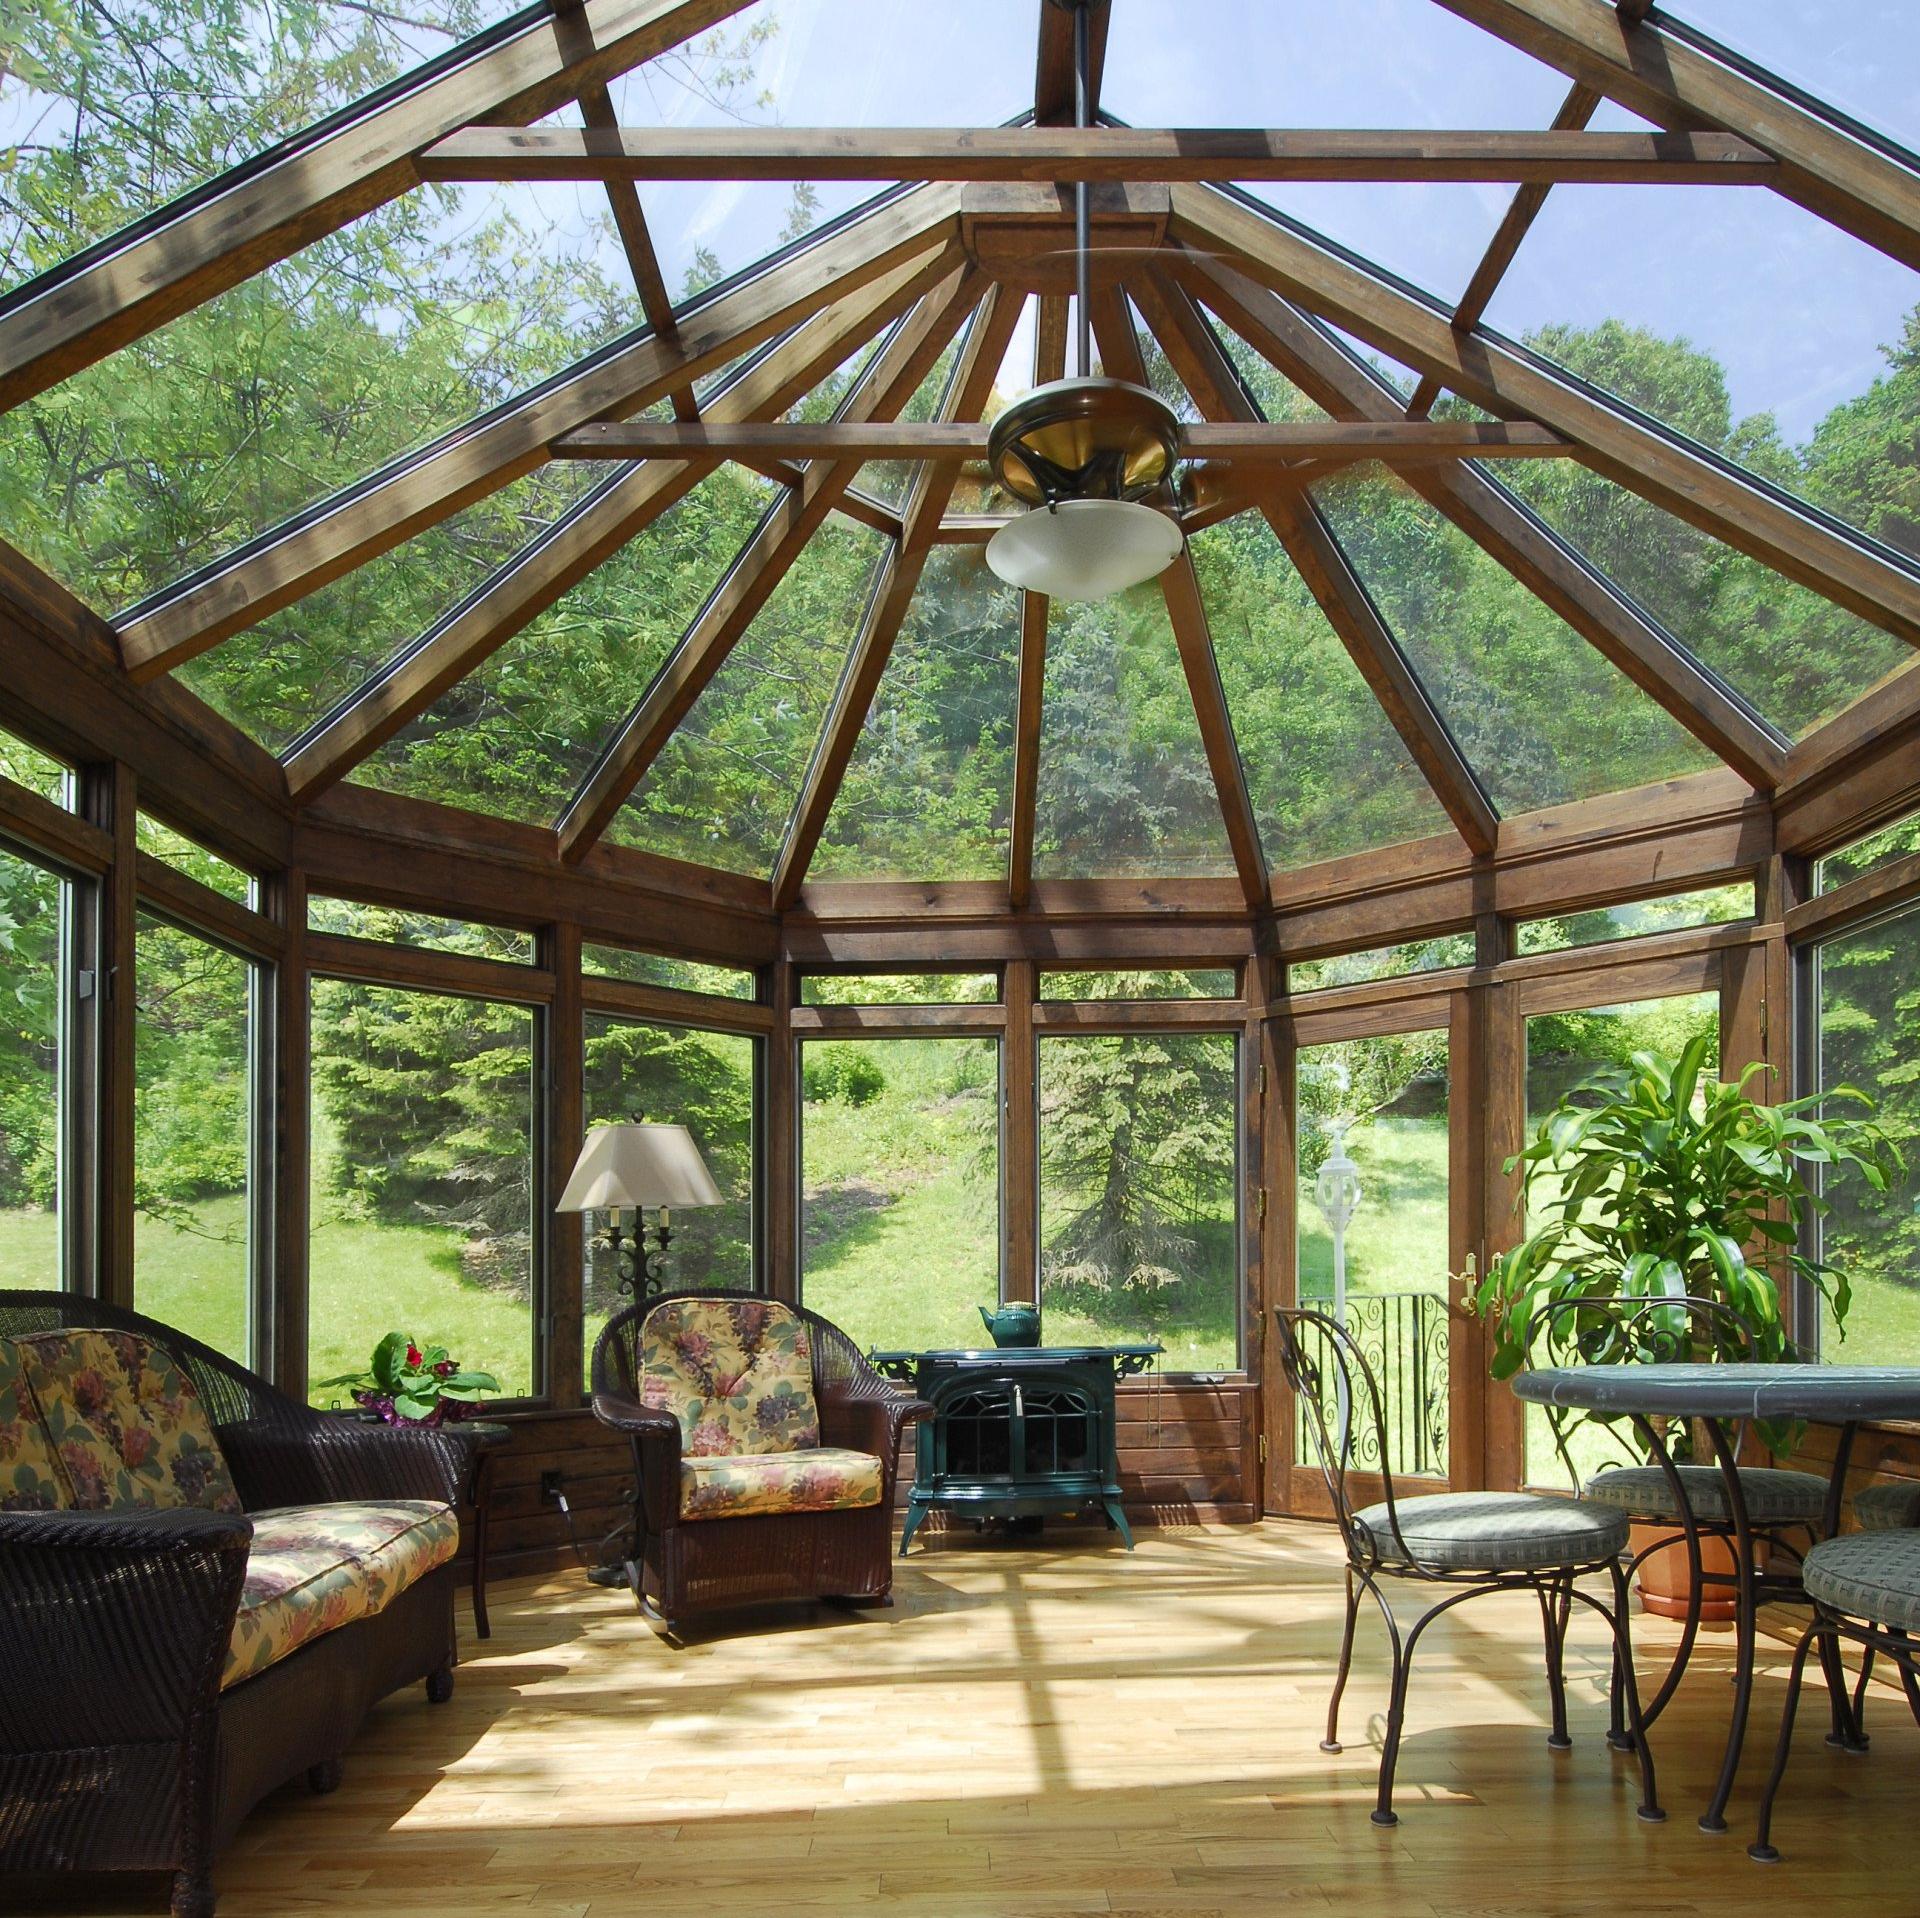 Four Seasons Sunrooms of Ann Arbor Conservatory Sunroom ...